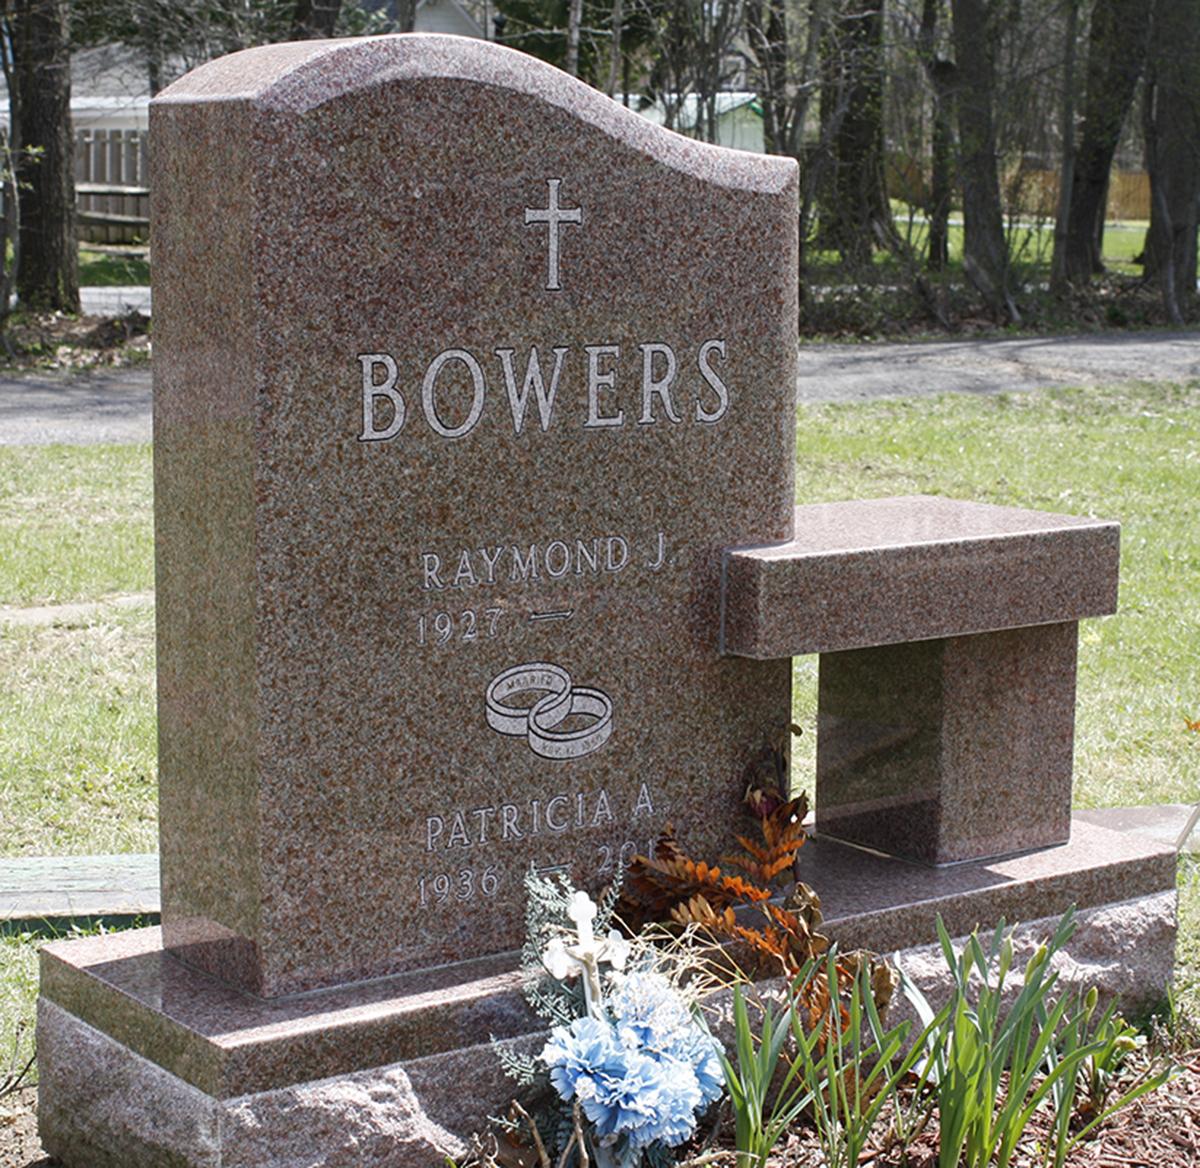 Bowers pink bench memorial.jpg